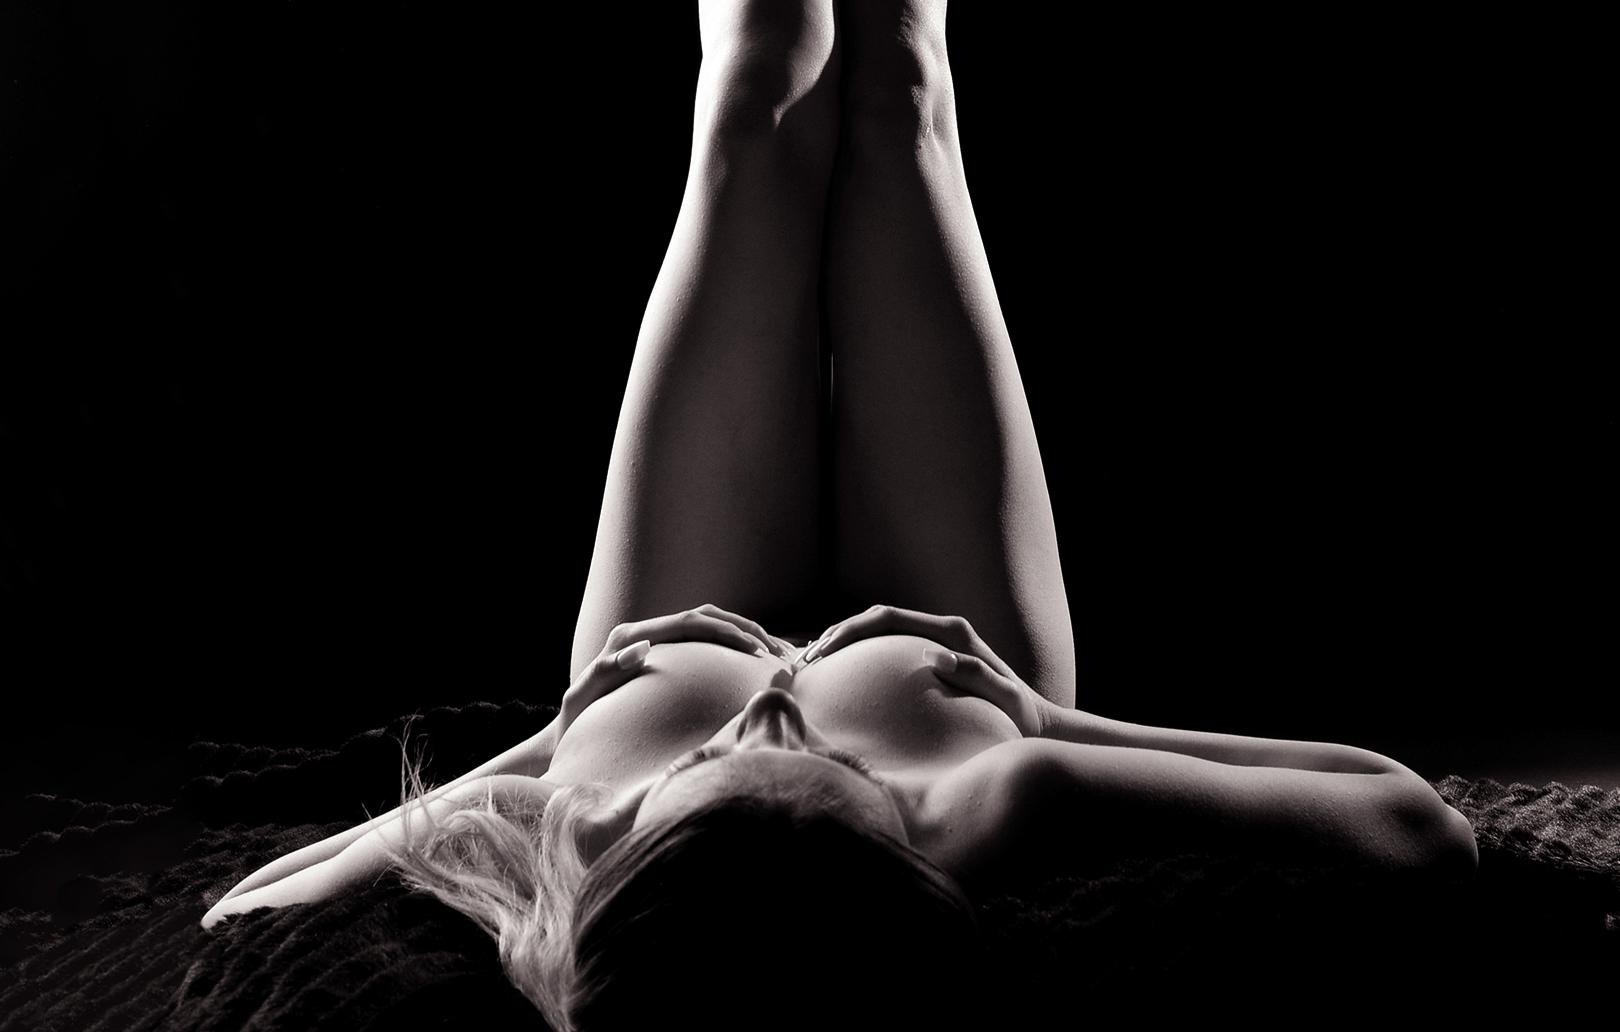 erotisches-fotoshooting-bad-oeynhausen-bg21610531350